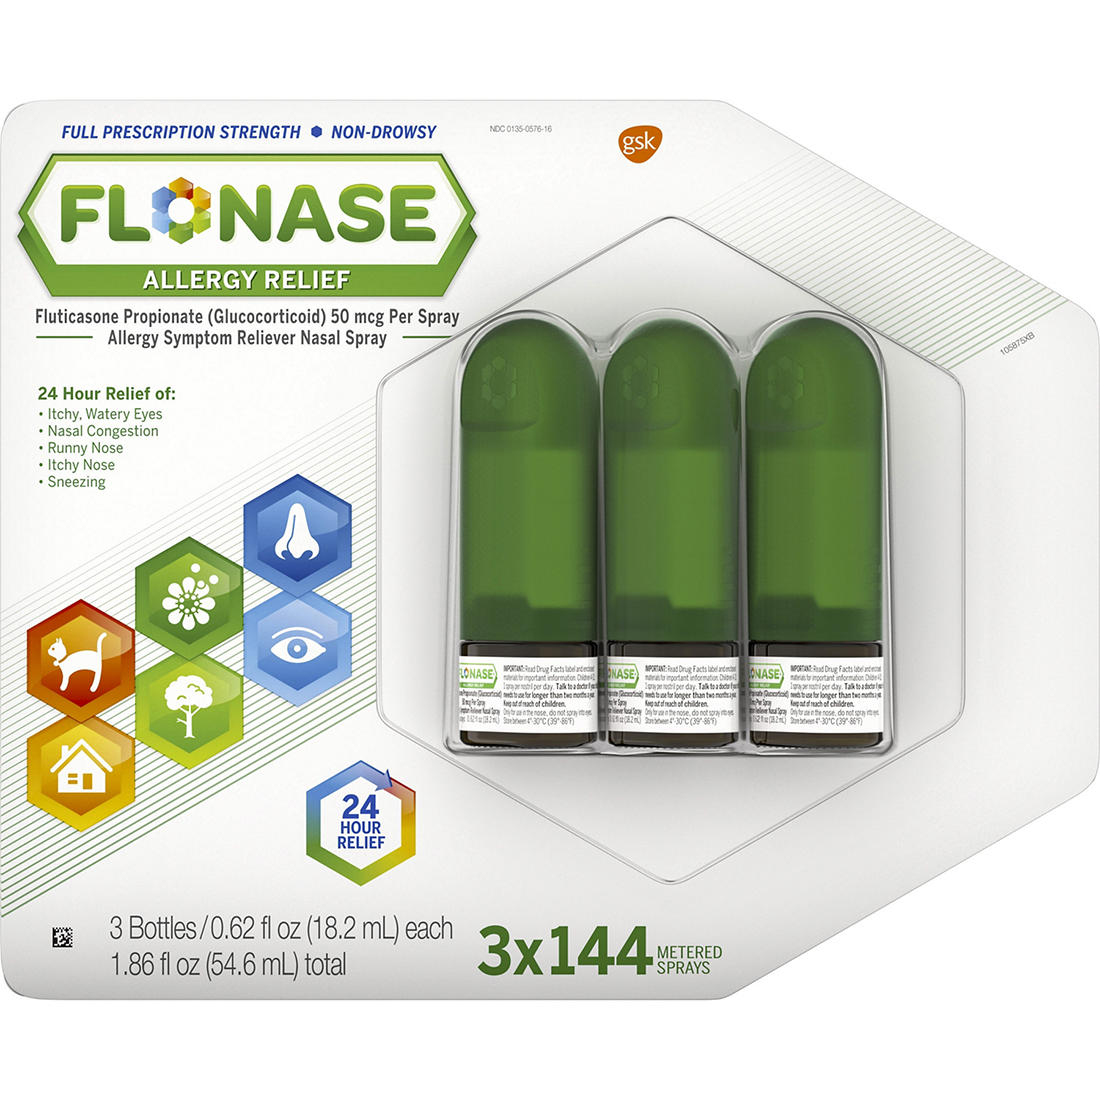 graphic about Flonase Coupon Printable identified as Flonase Allergy Reduction Nose Spray, 3 pk./0.62 fl. oz.